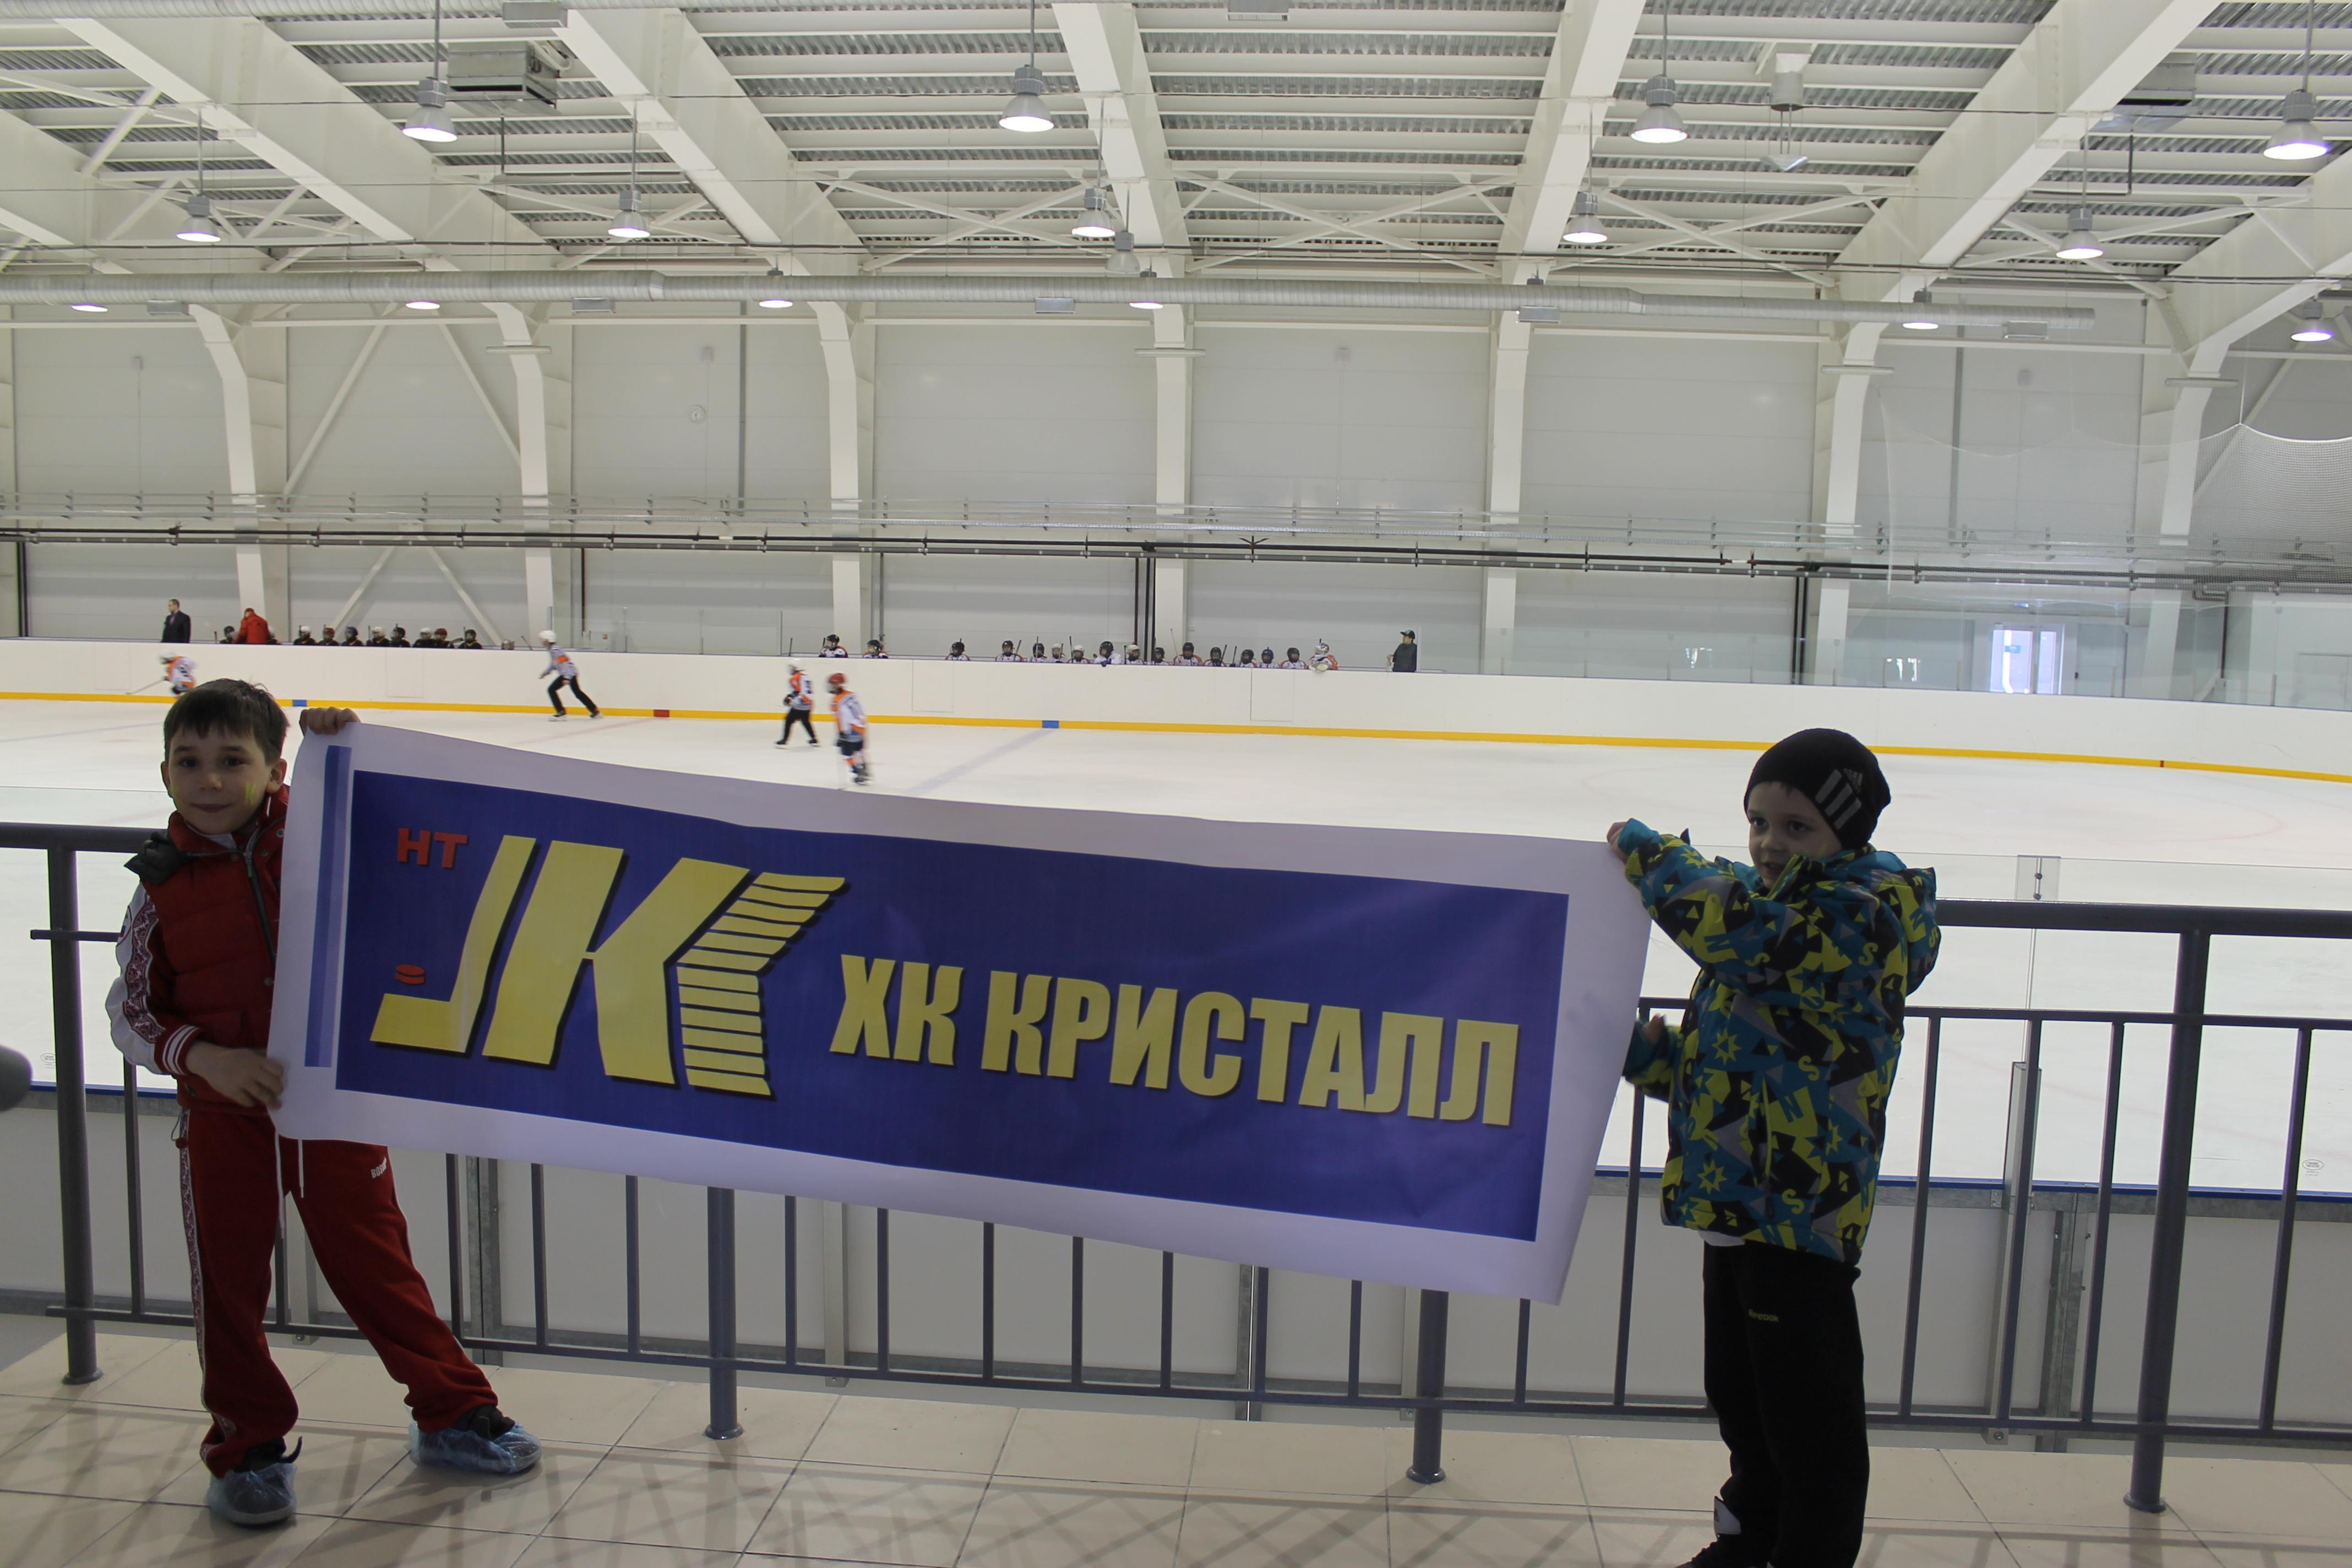 Кубок ХК КРИСТАЛЛ